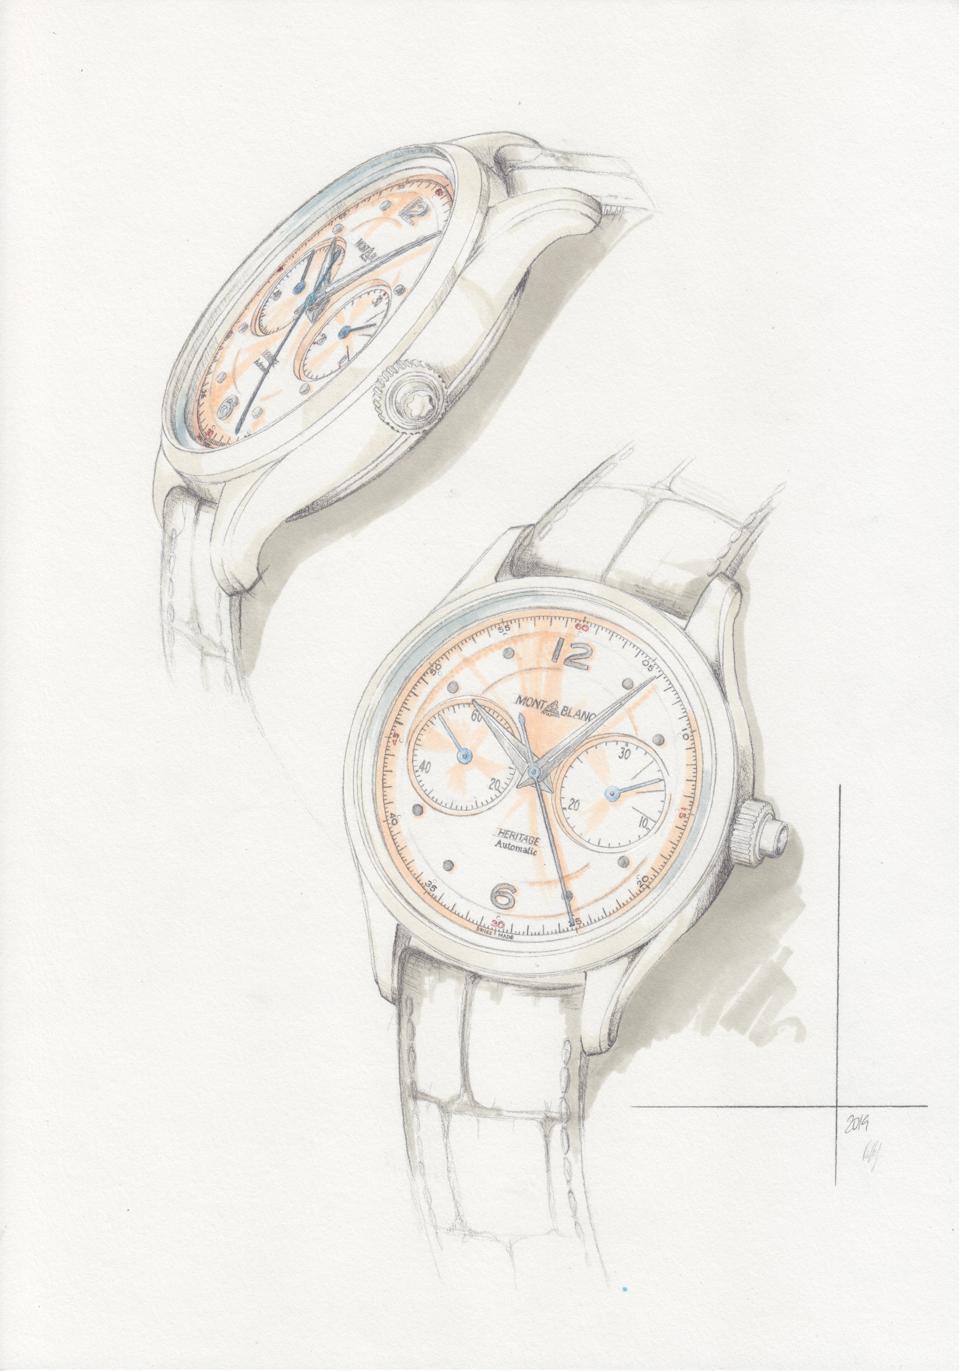 Montblanc Heritage Monopusher Chronograph 2020